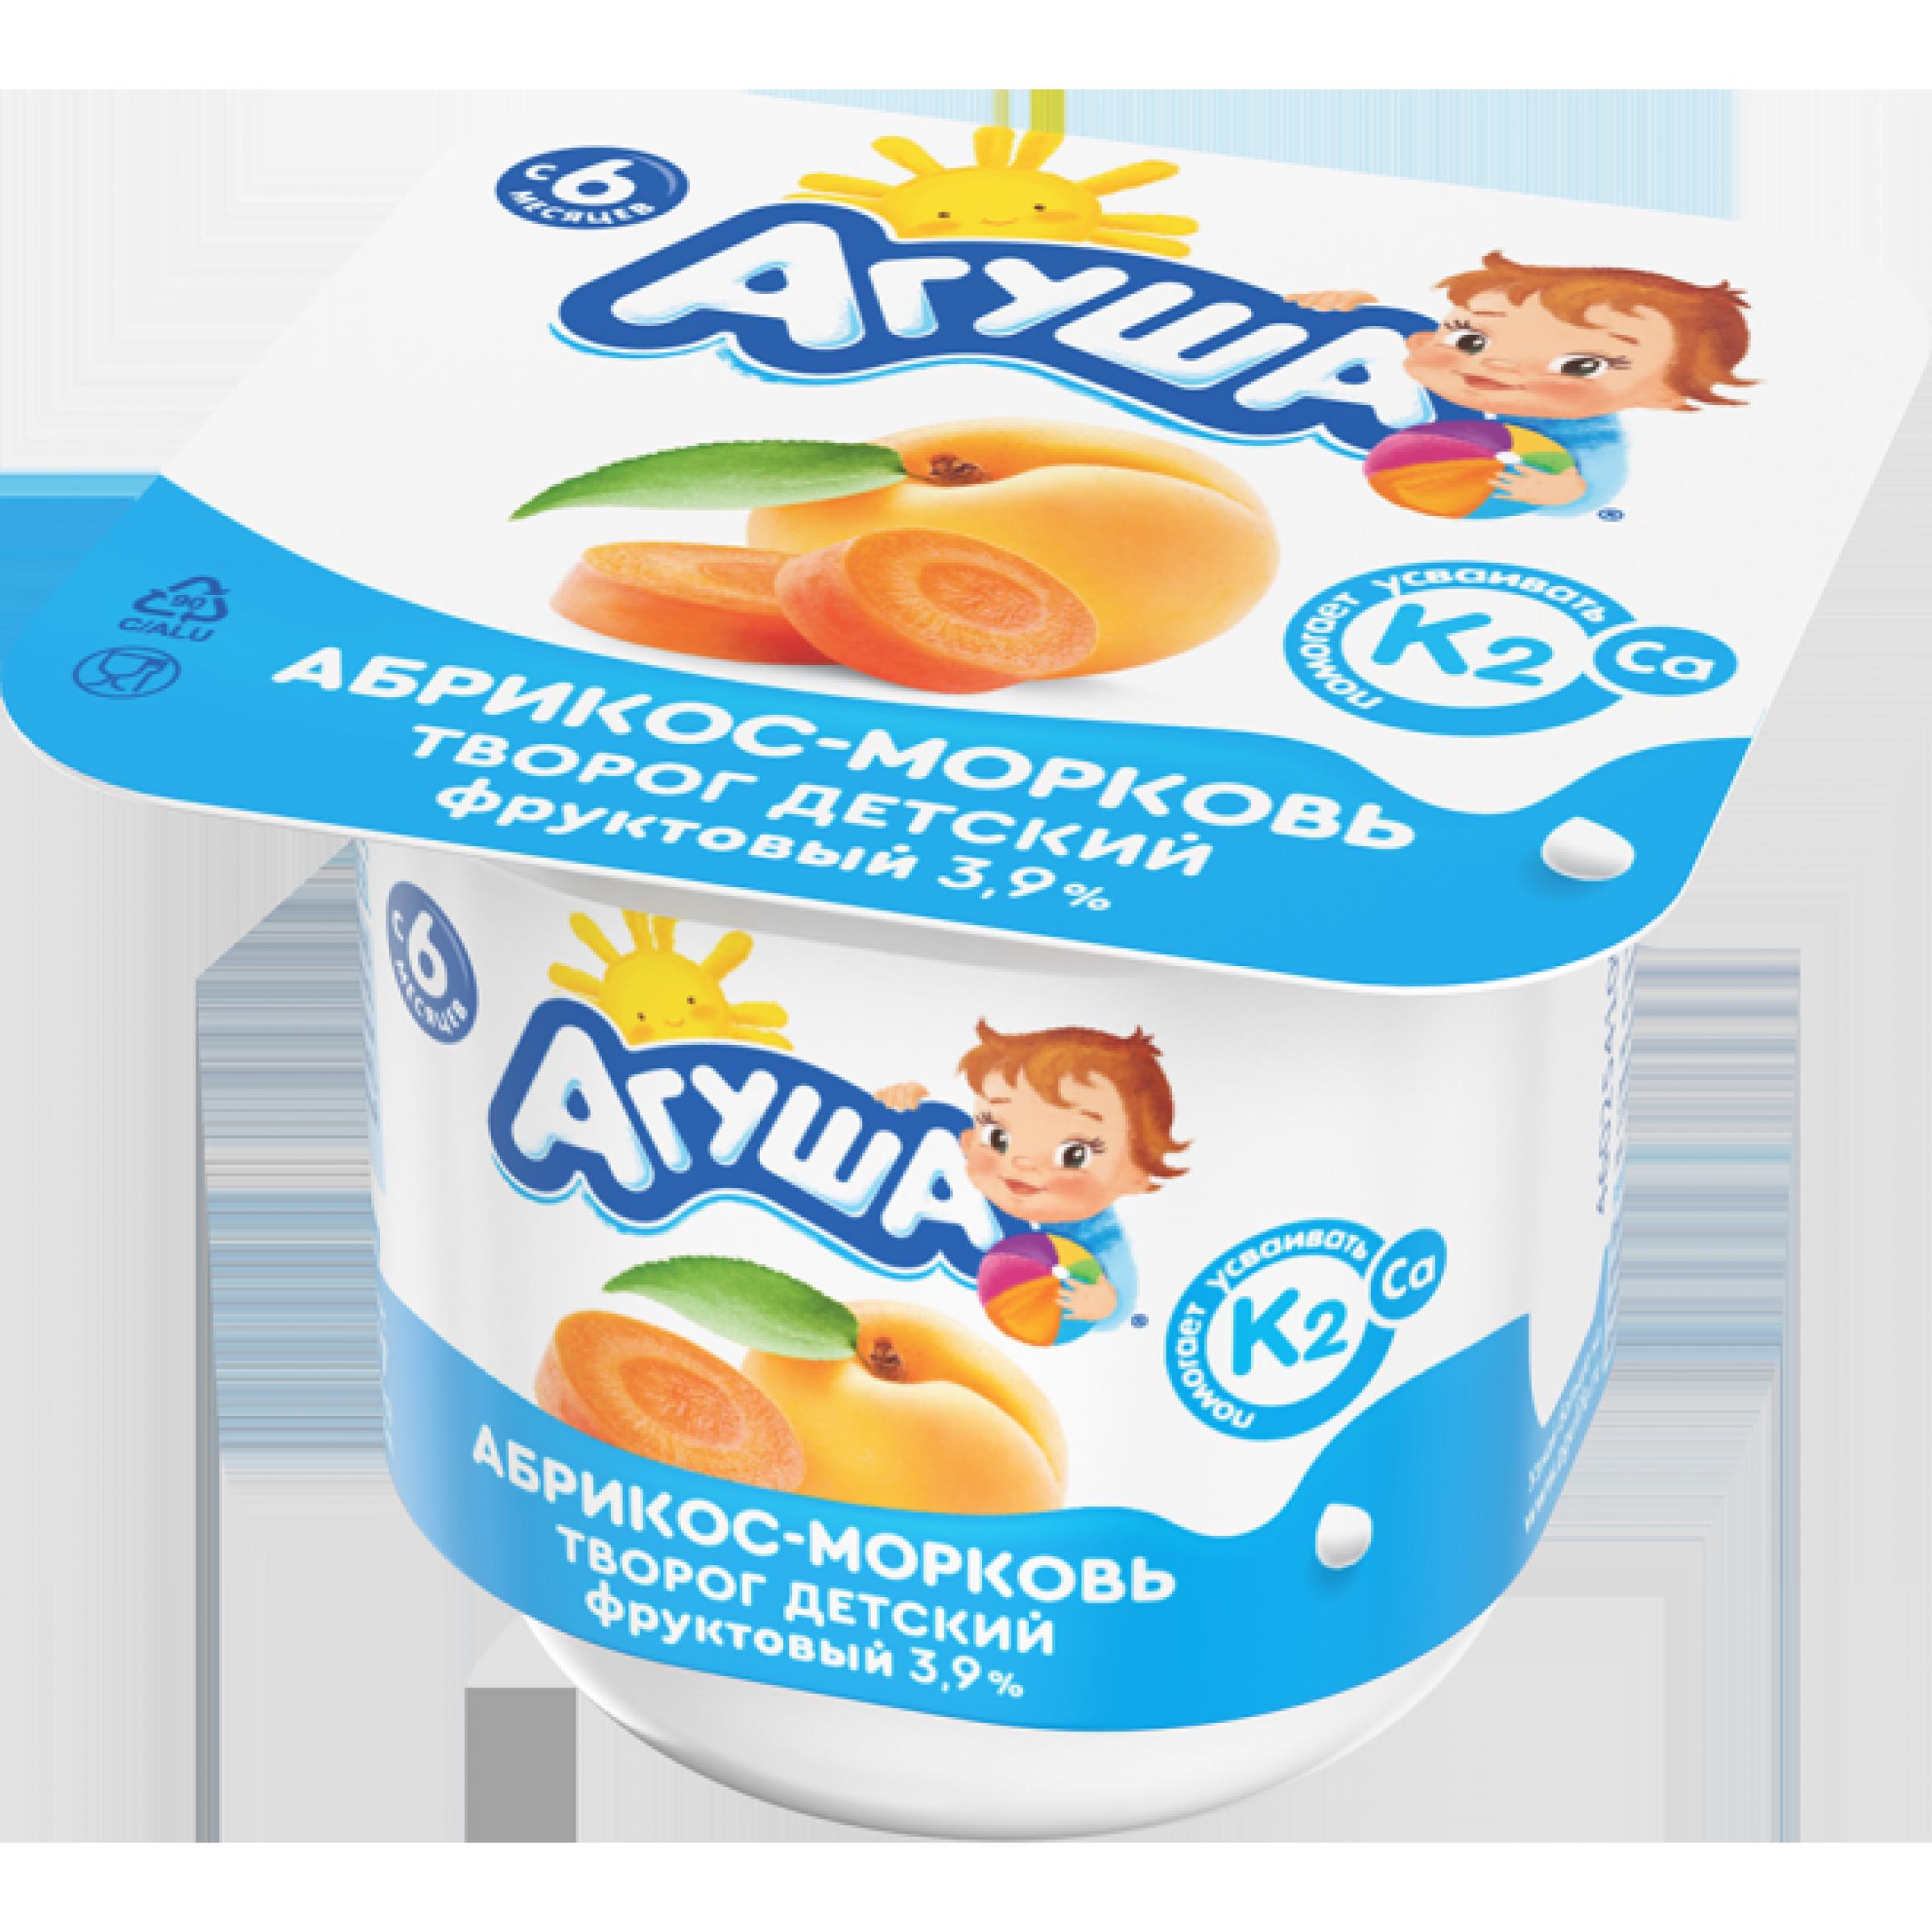 "Творог ""Агуша"" детский 3, 9% абрикос-морковь, 100гр."